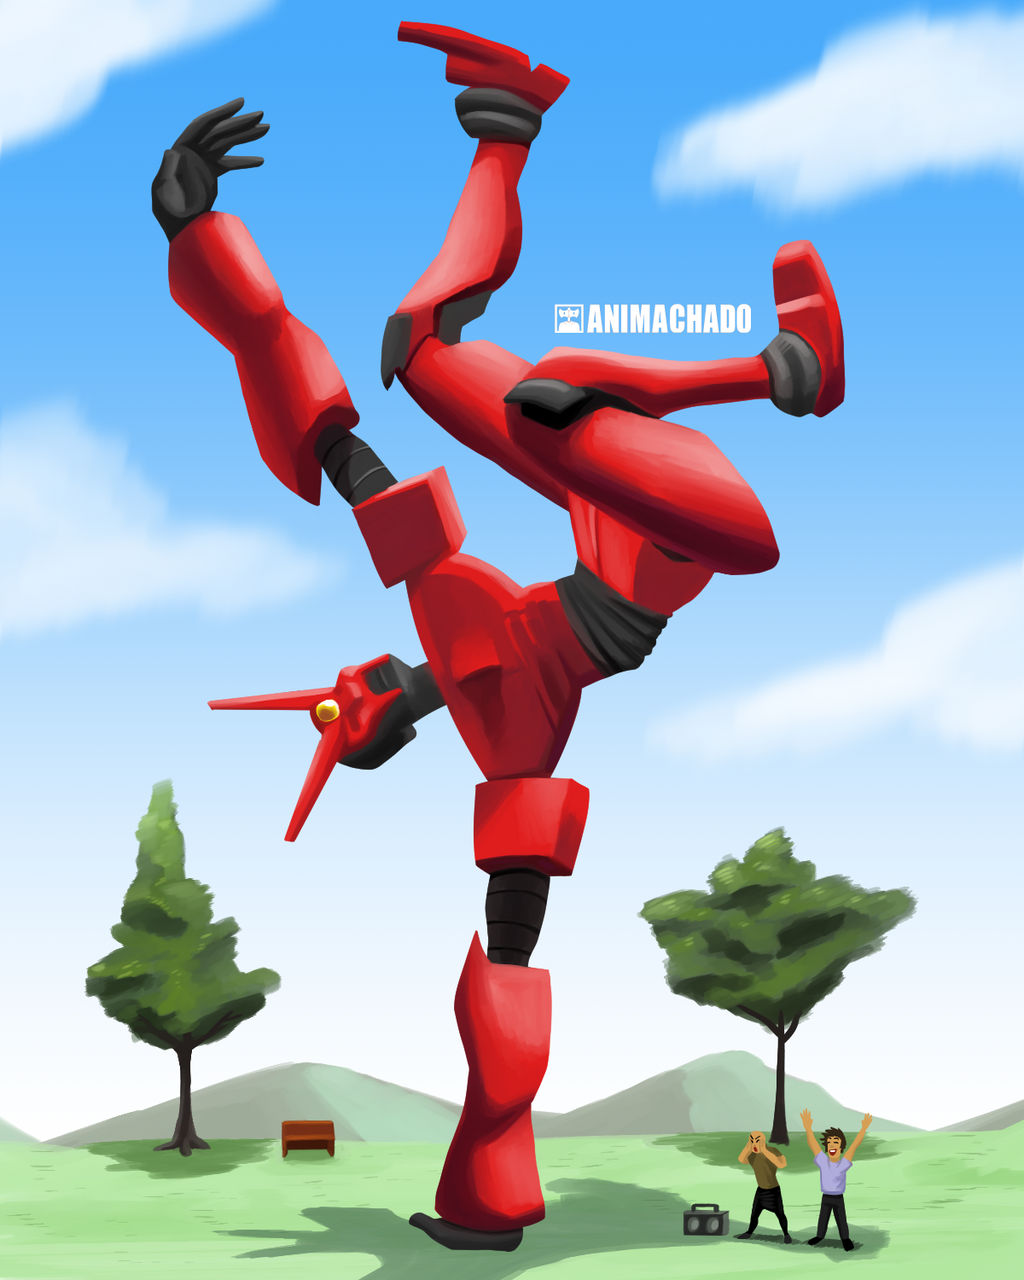 Mecha dancing breakdance by Animachado